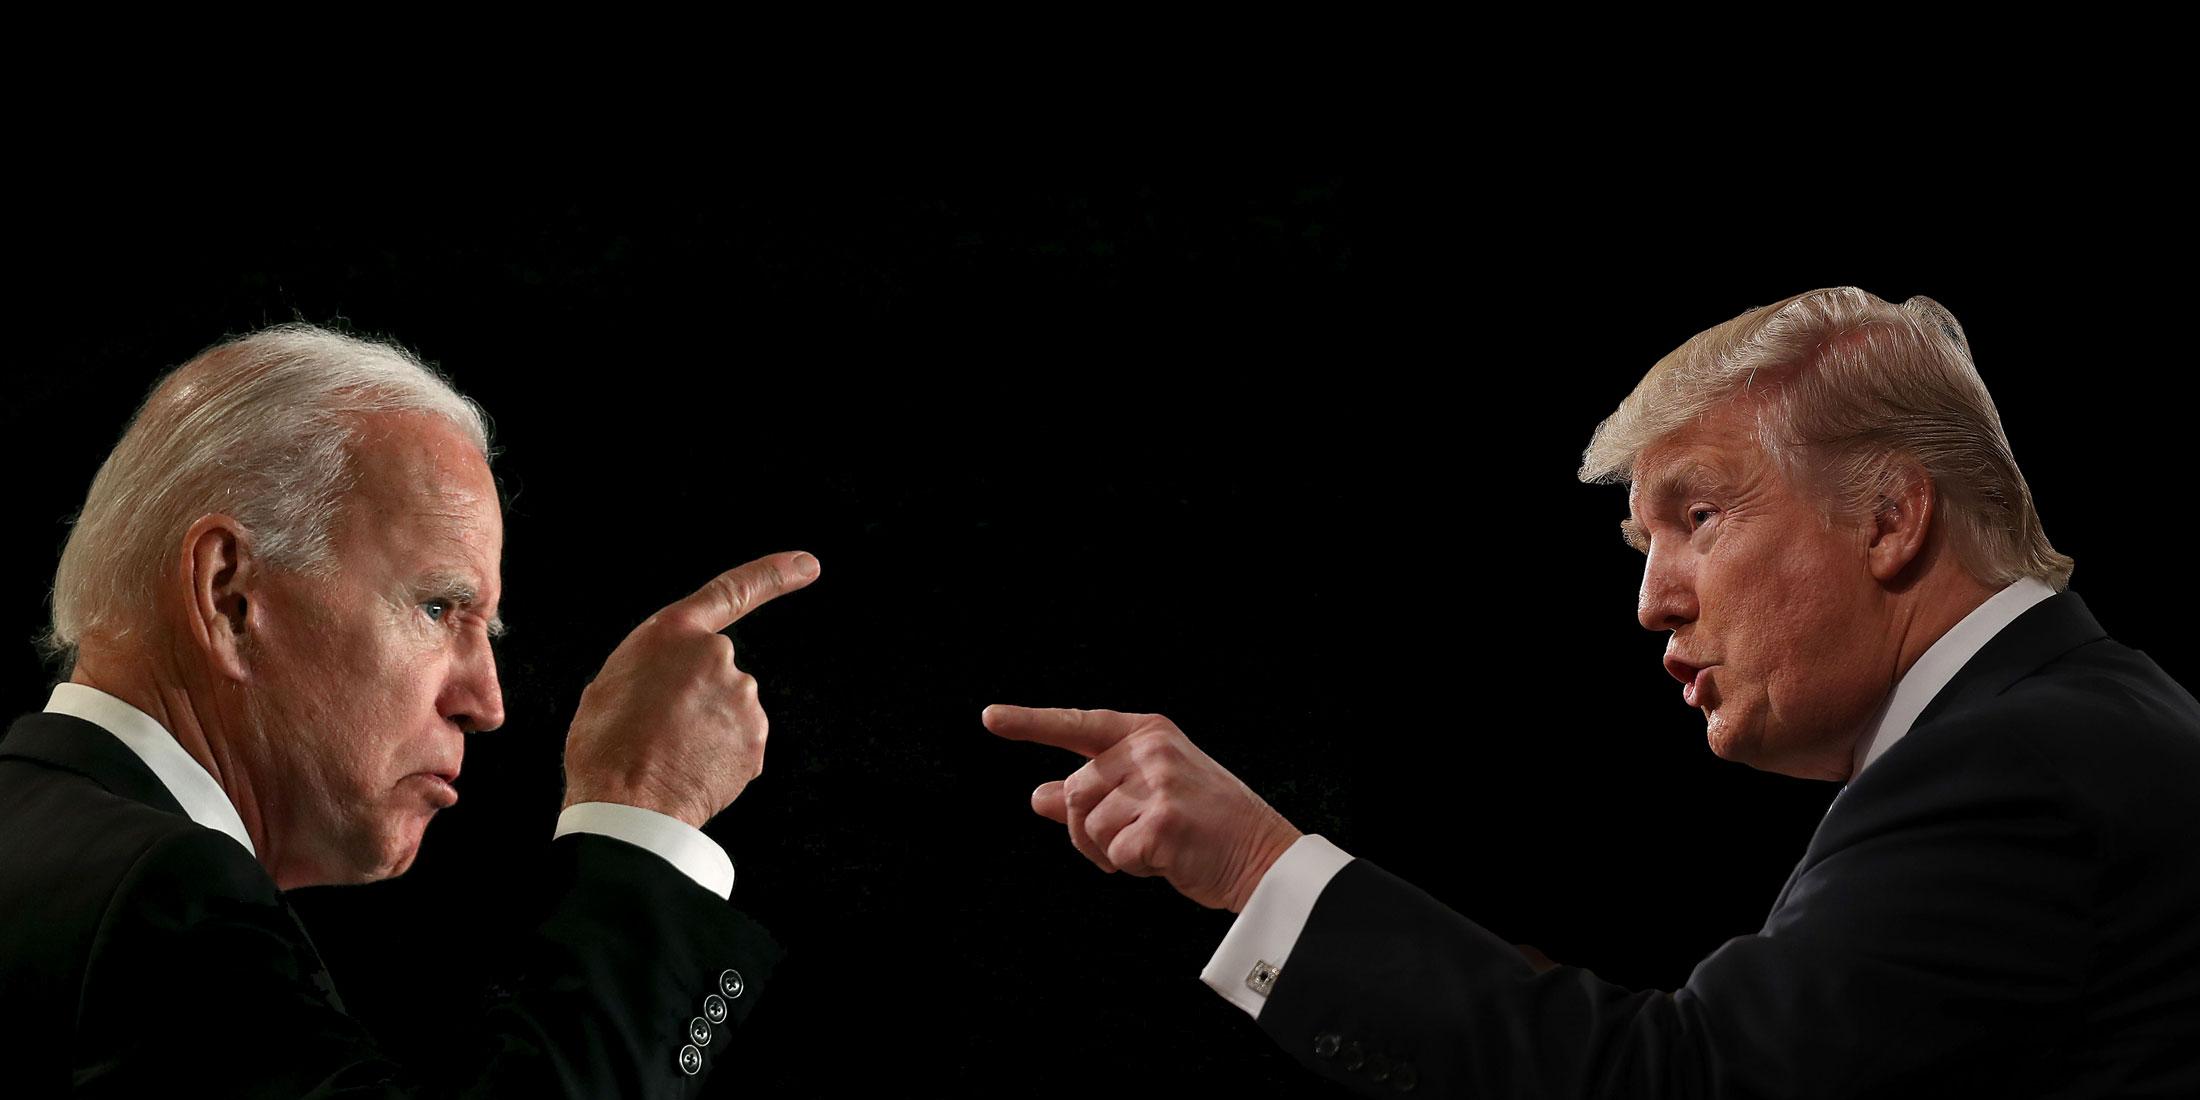 Donald Trump Vs. Joe Biden 2020 Quiz: Who Said That Quote?